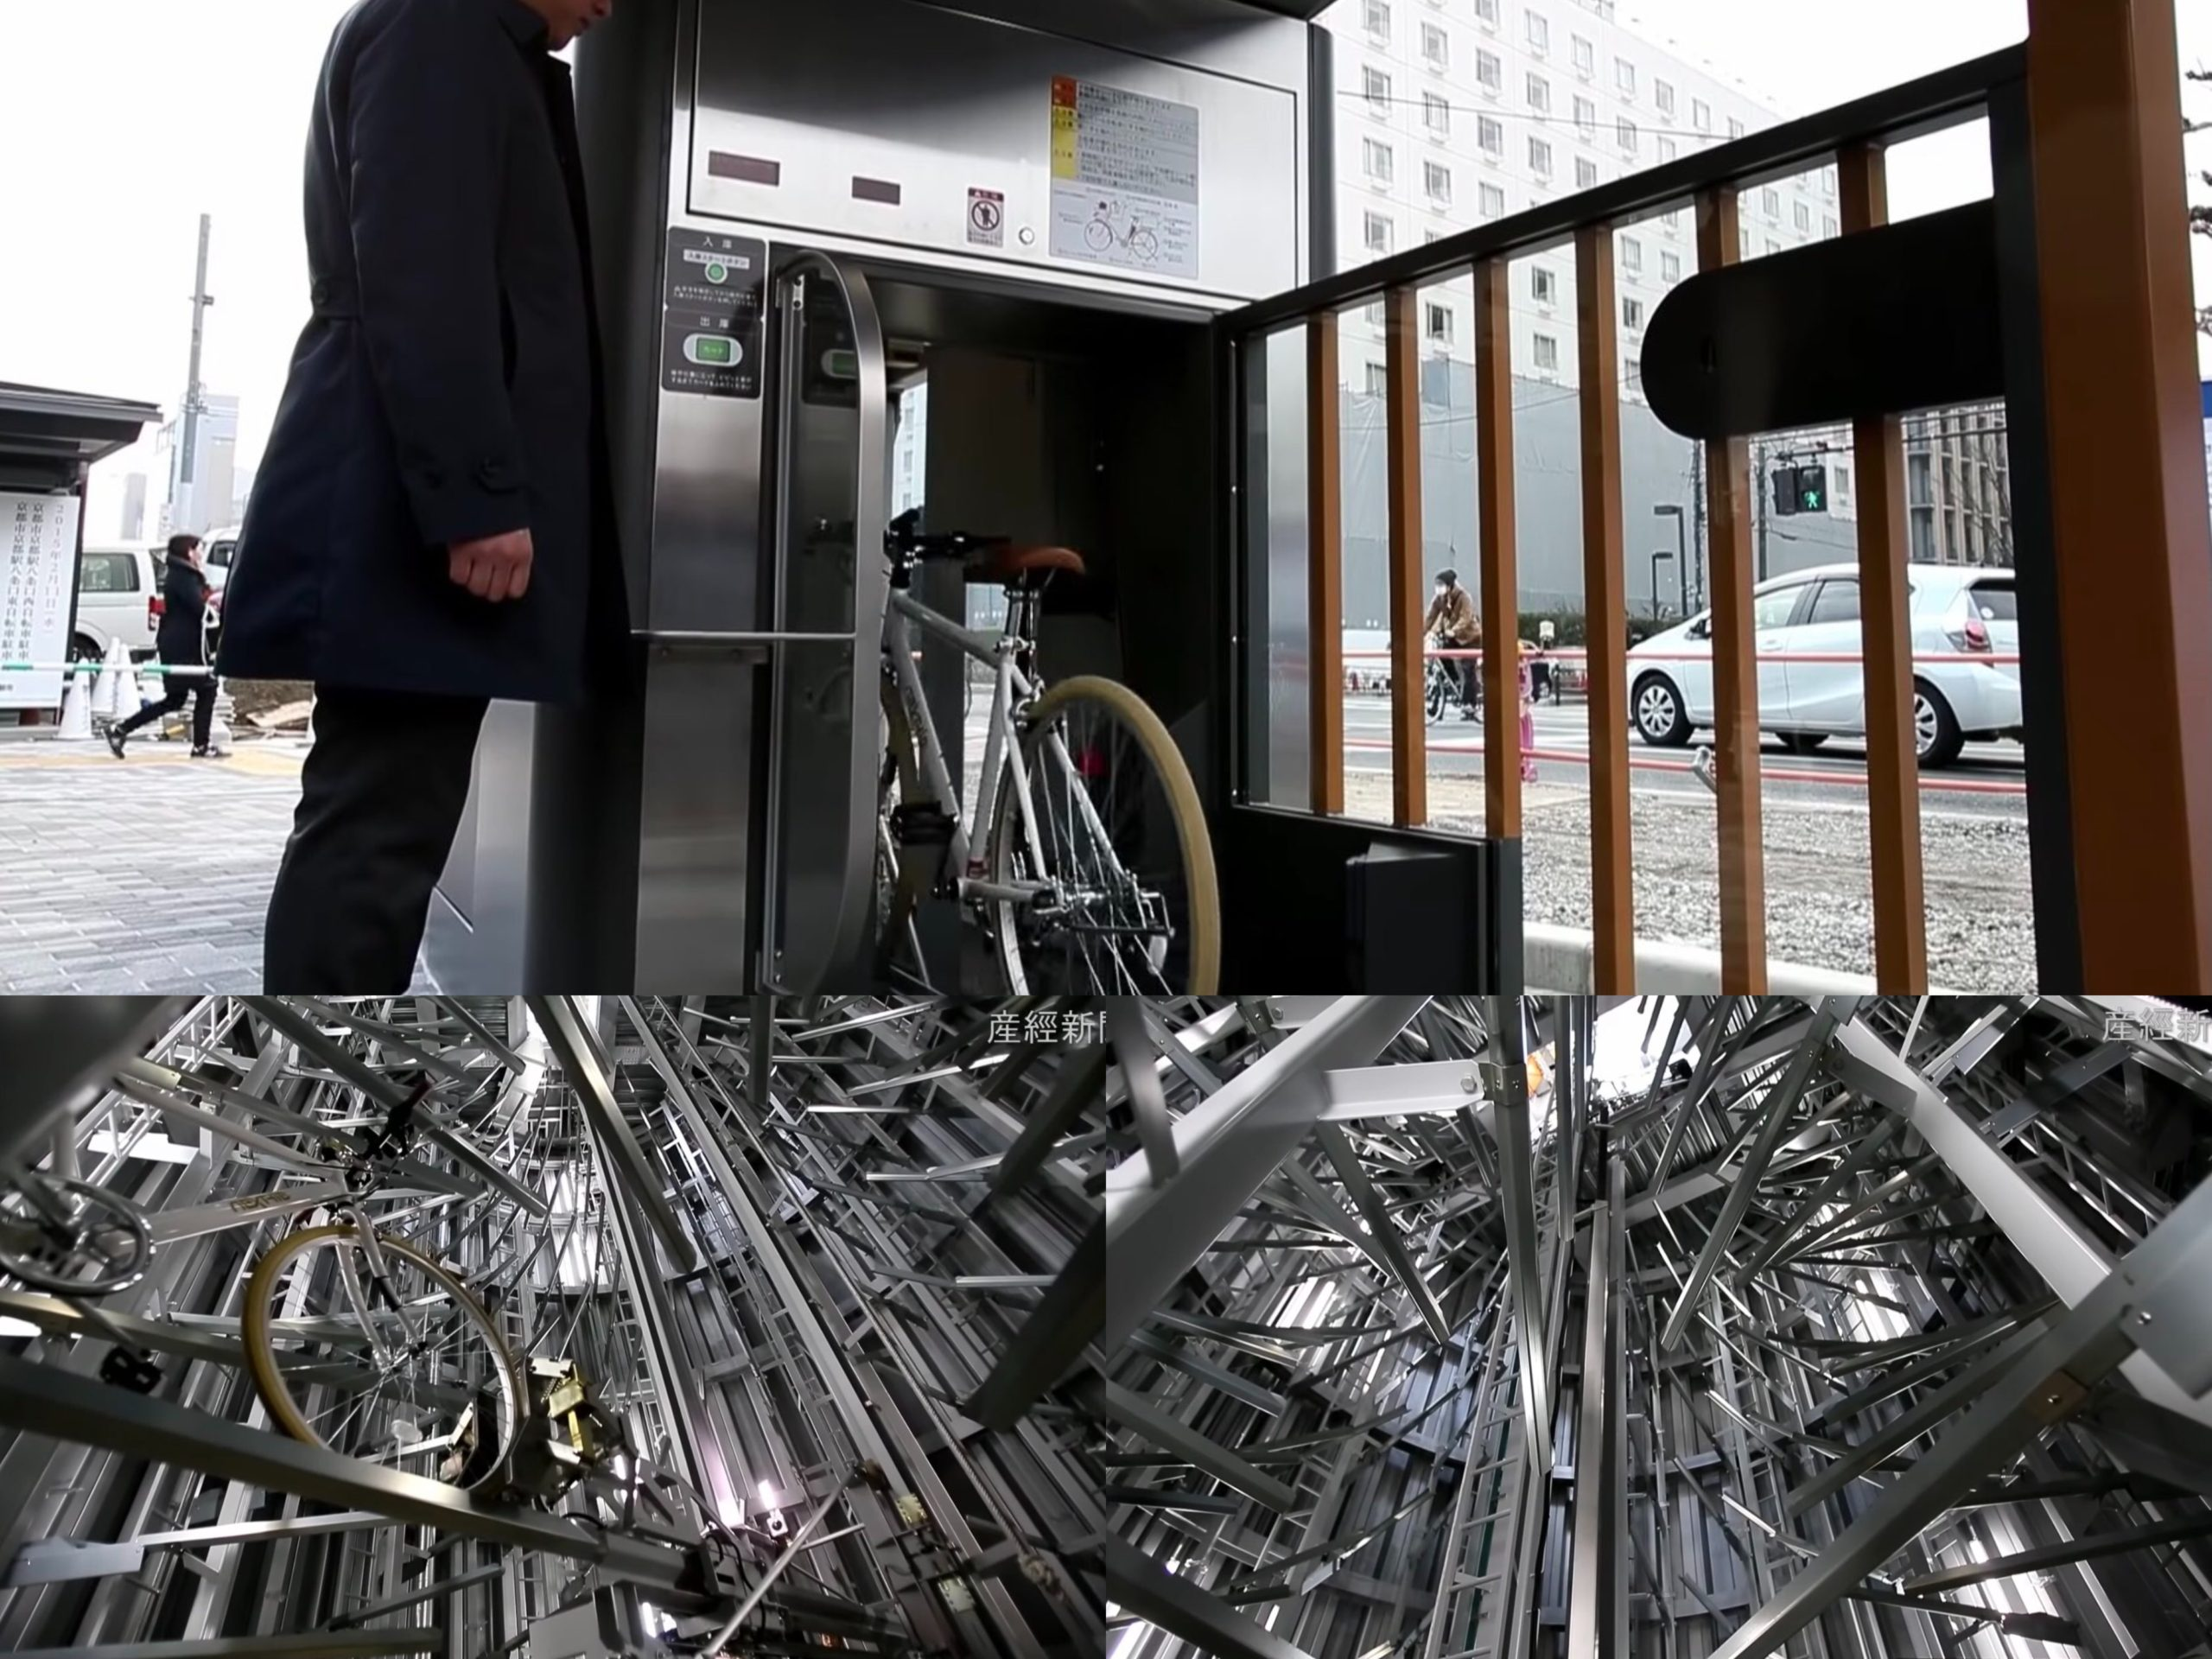 Tempat Letak Basikal Di Jepun & China! Lain Macam Teknologi Diorang!